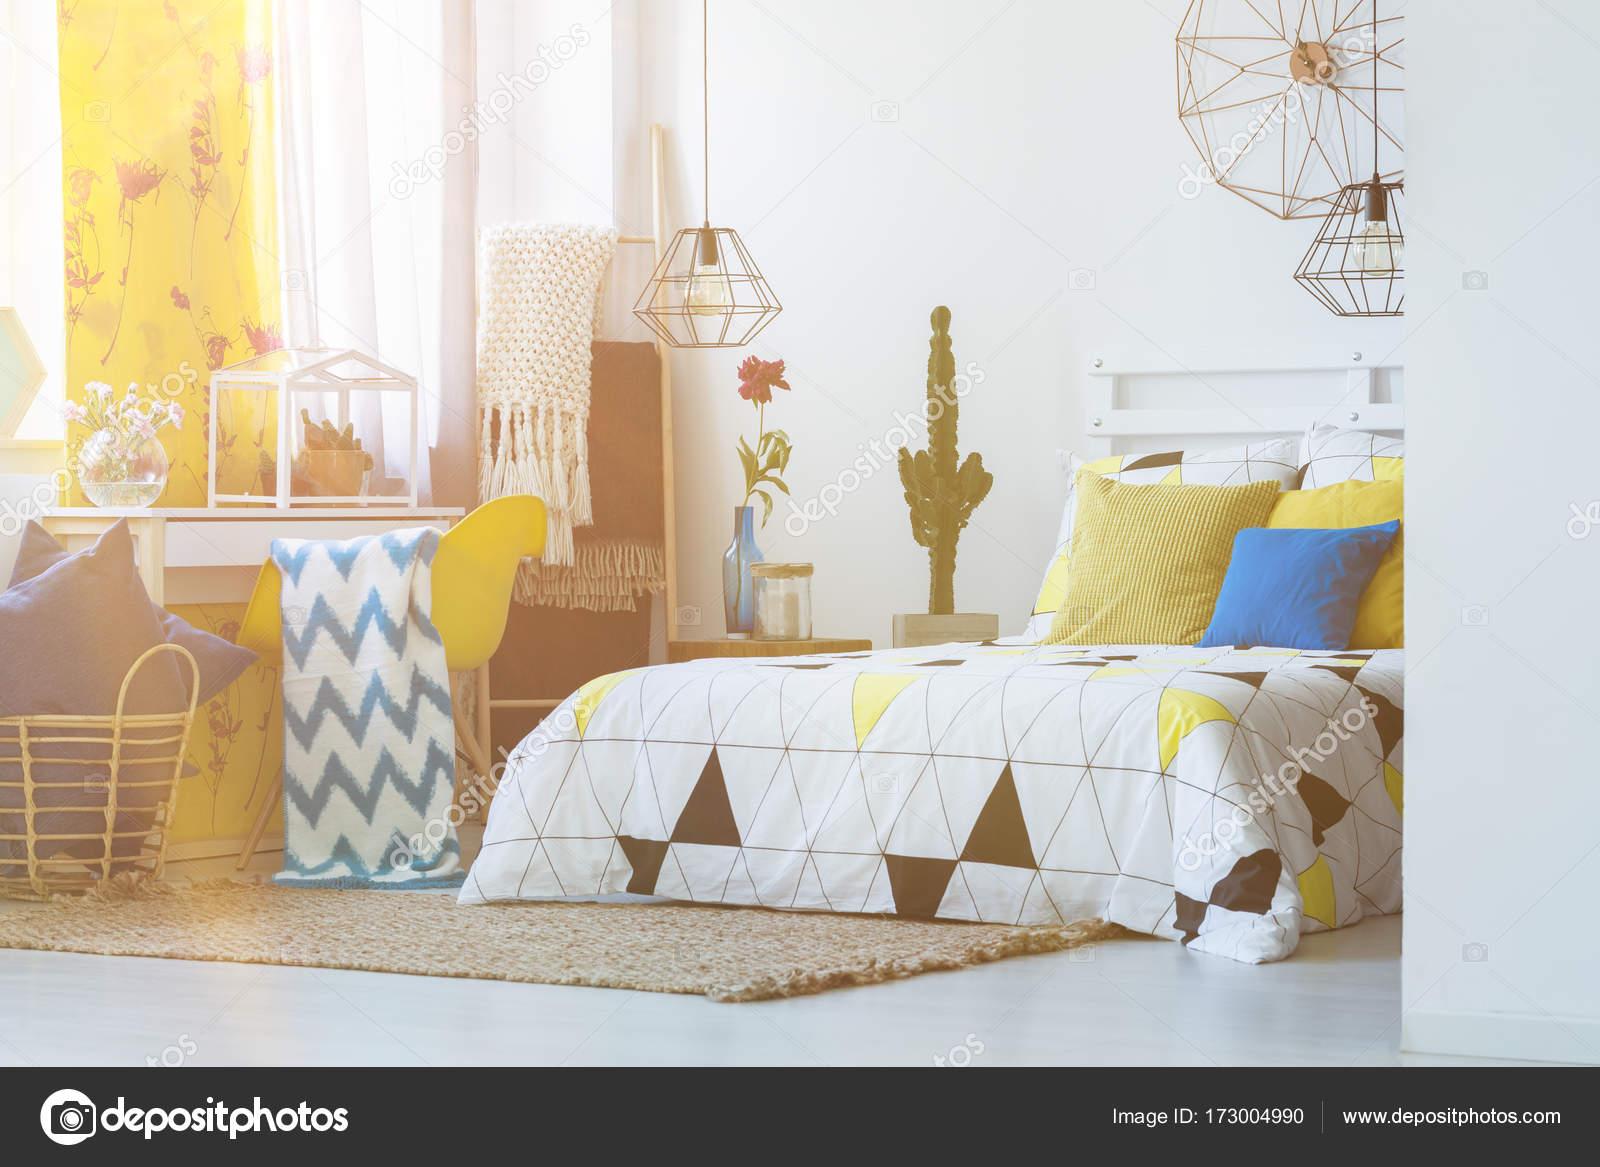 Folk Schlafzimmer mit Kaktus — Stockfoto © photographee.eu #173004990